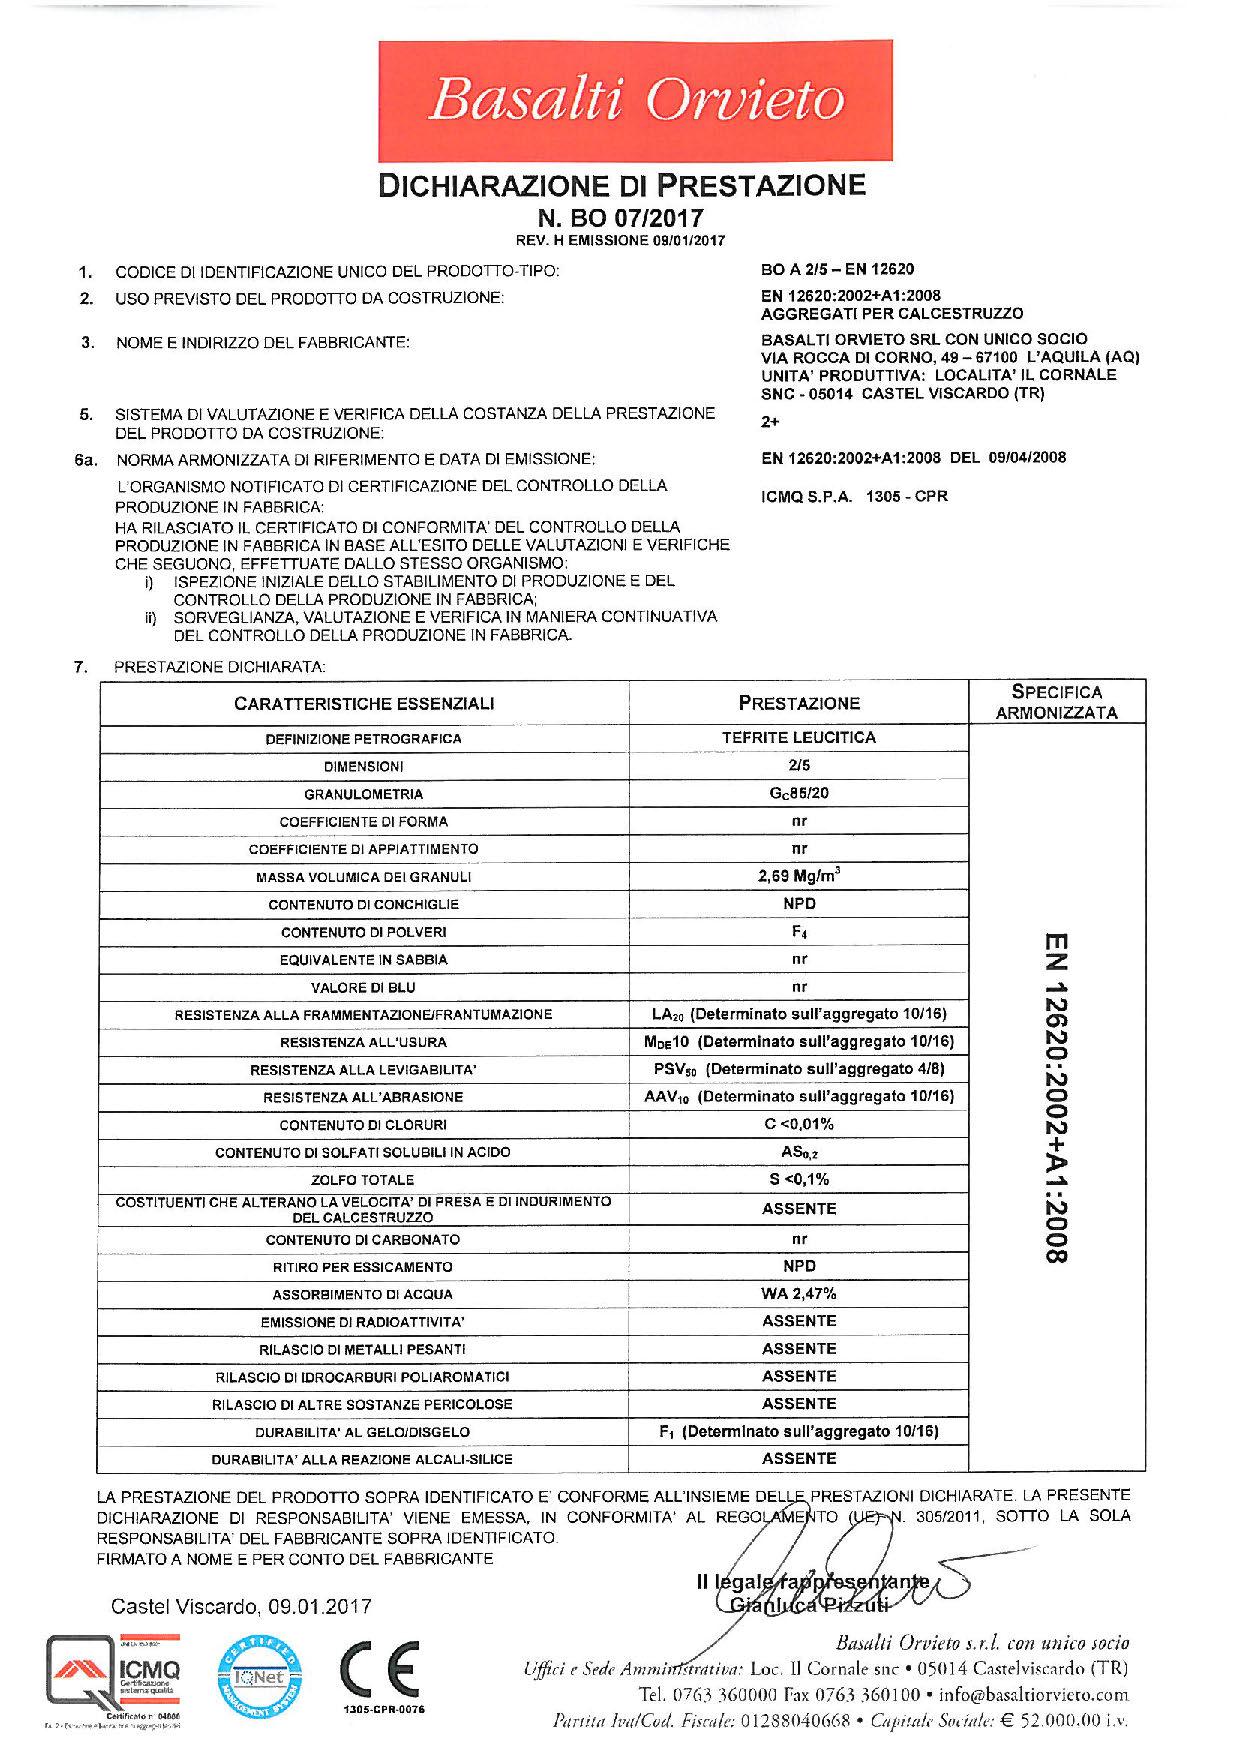 Calcestruzzo_DoP 2-5 - EN 12620